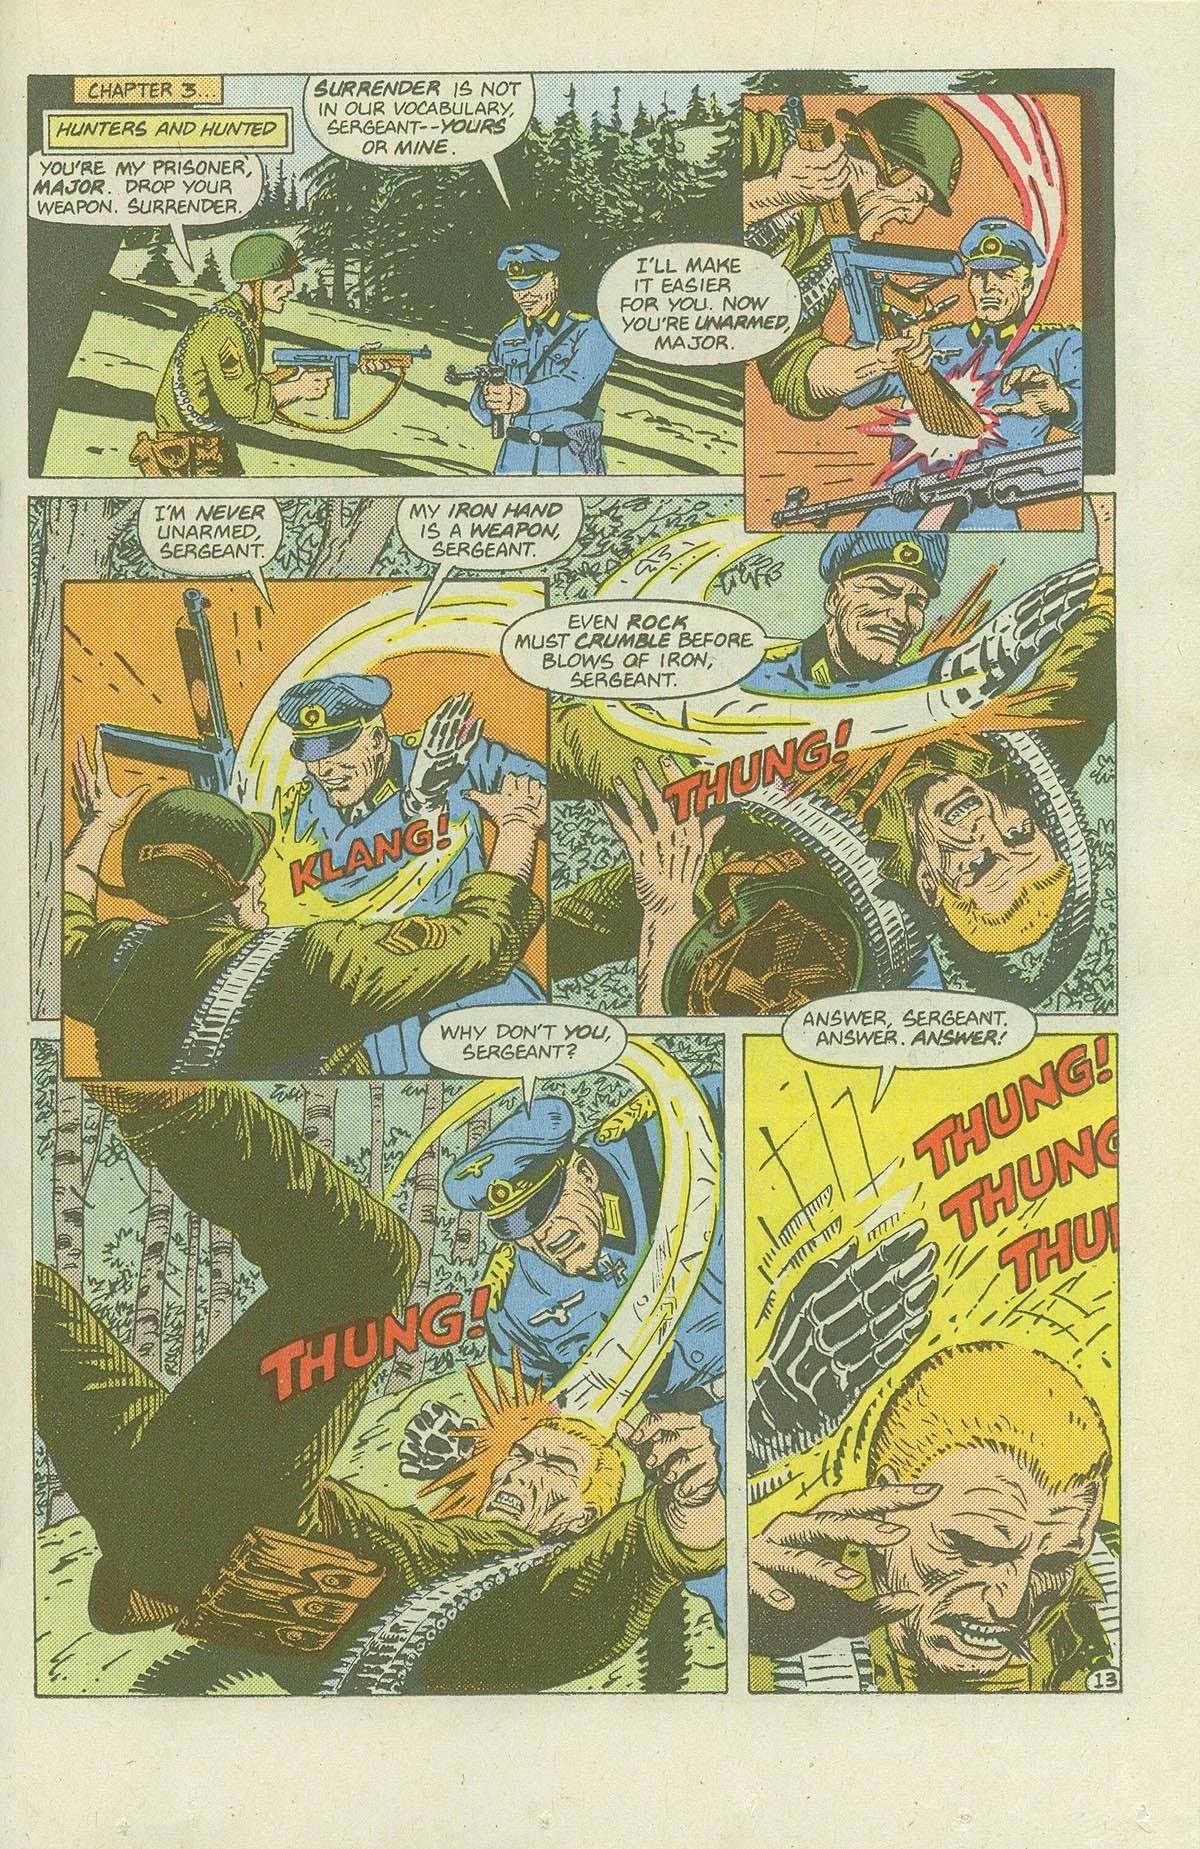 Read online Sgt. Rock comic -  Issue #420 - 18